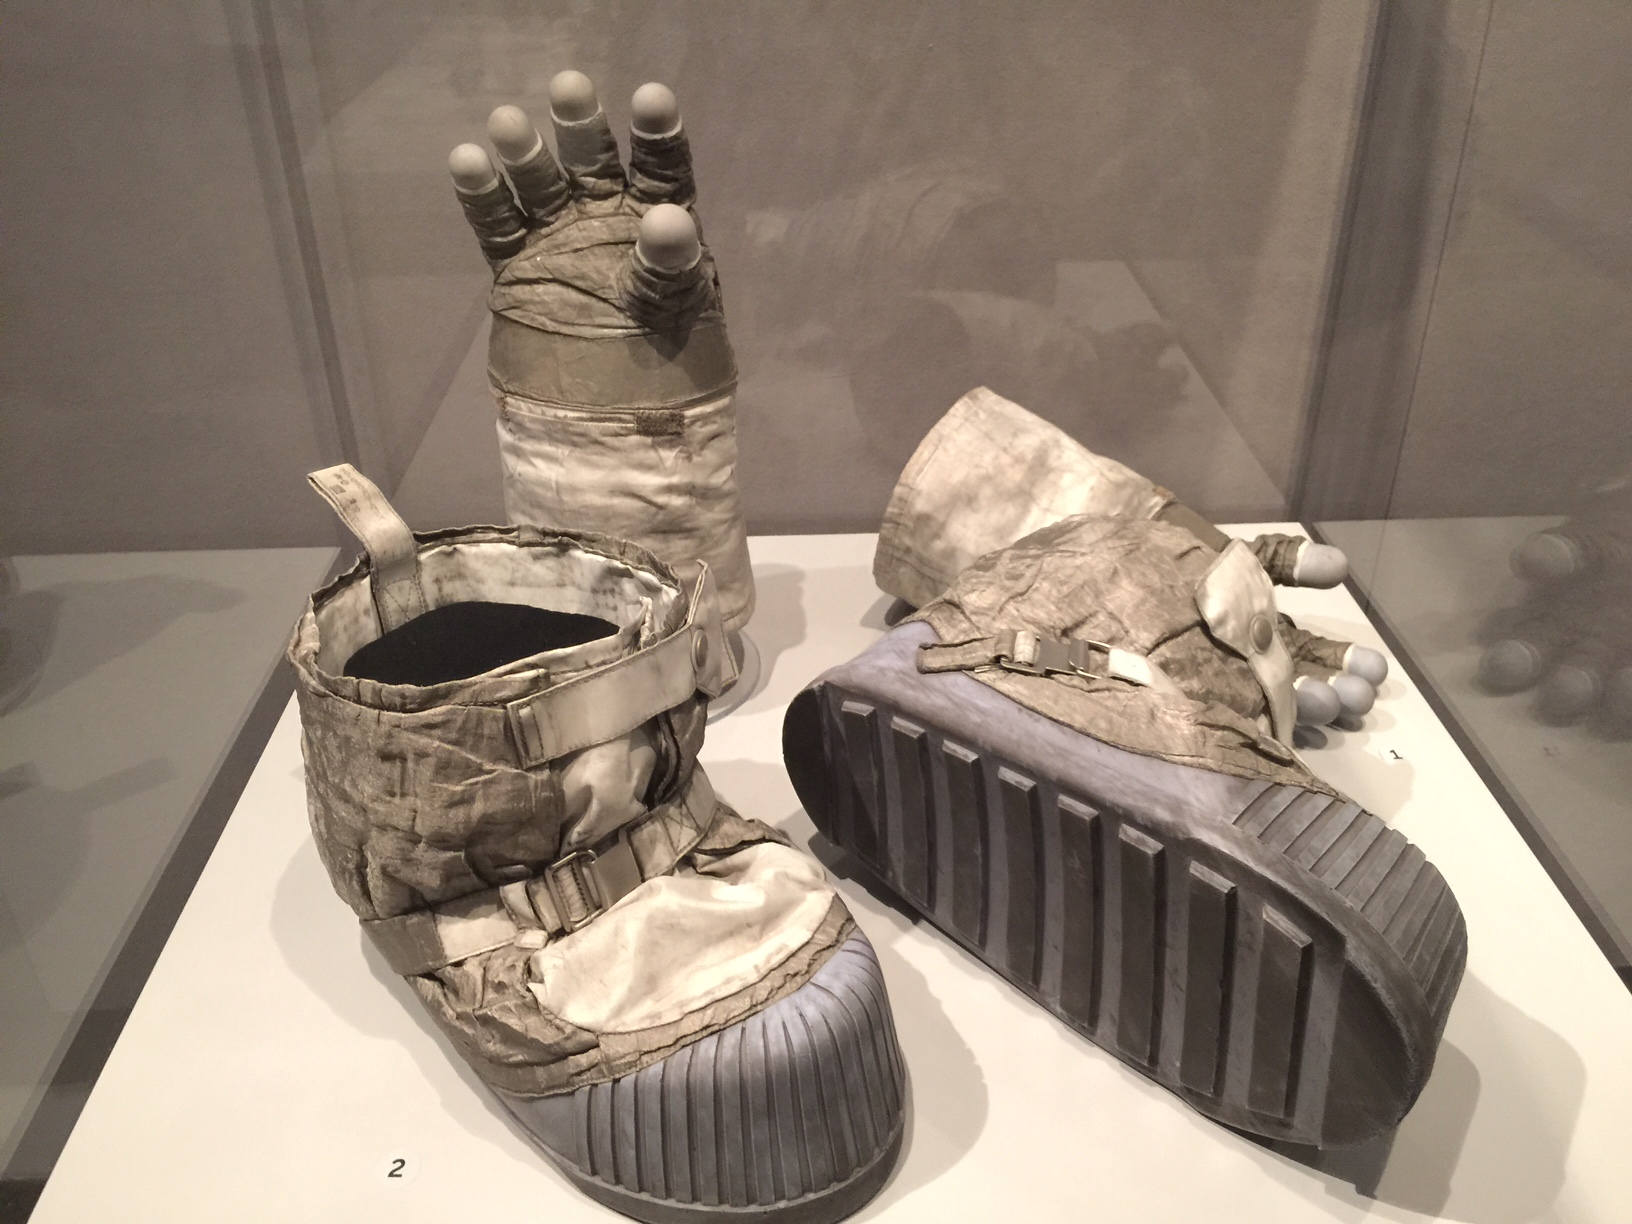 apollo 11 space suit boots - photo #41